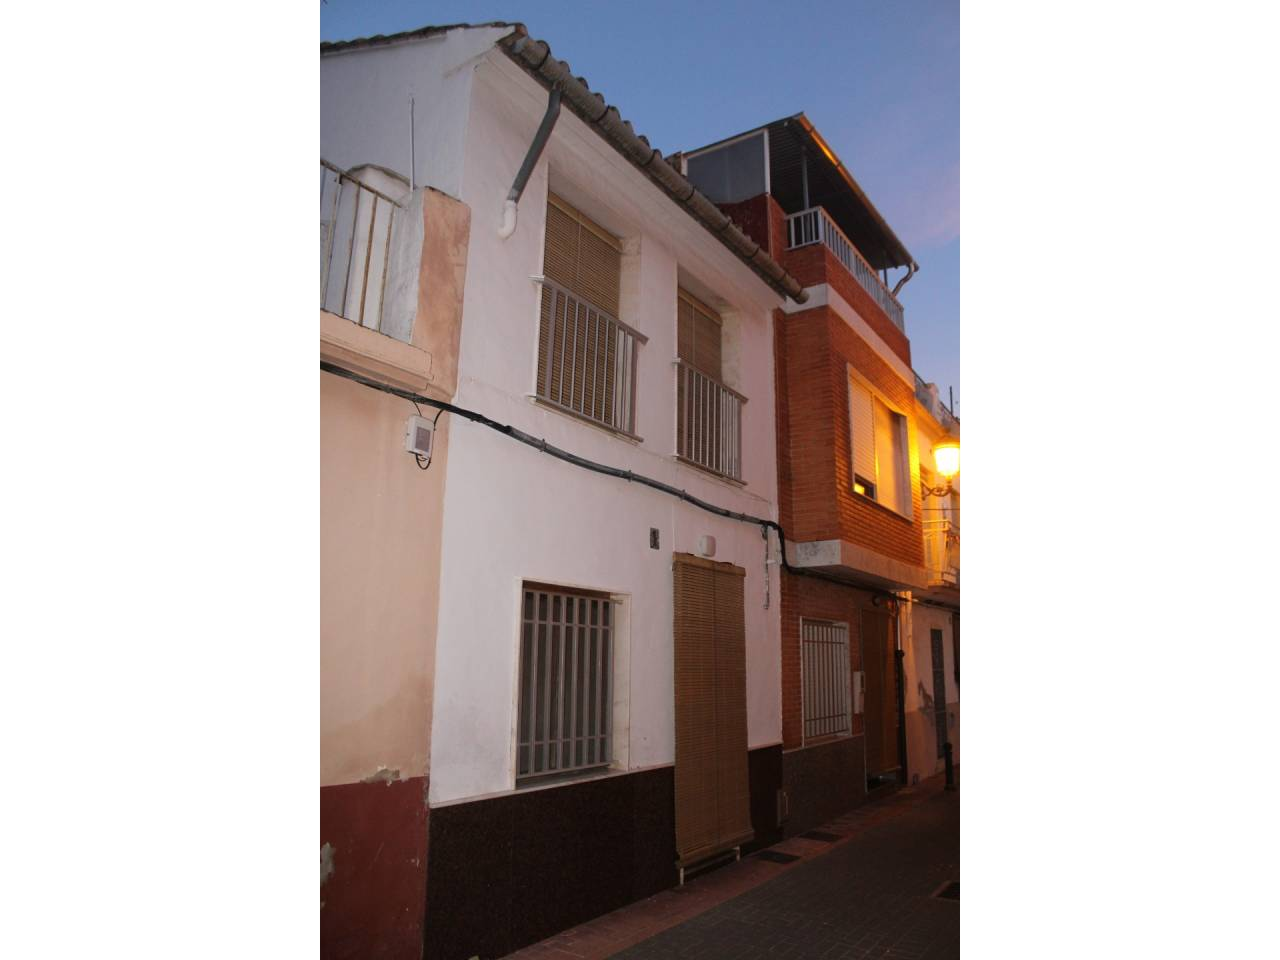 Casa  Calle ferran ii. Superficie total 264 m², casa superficie solar 132 m², superfici